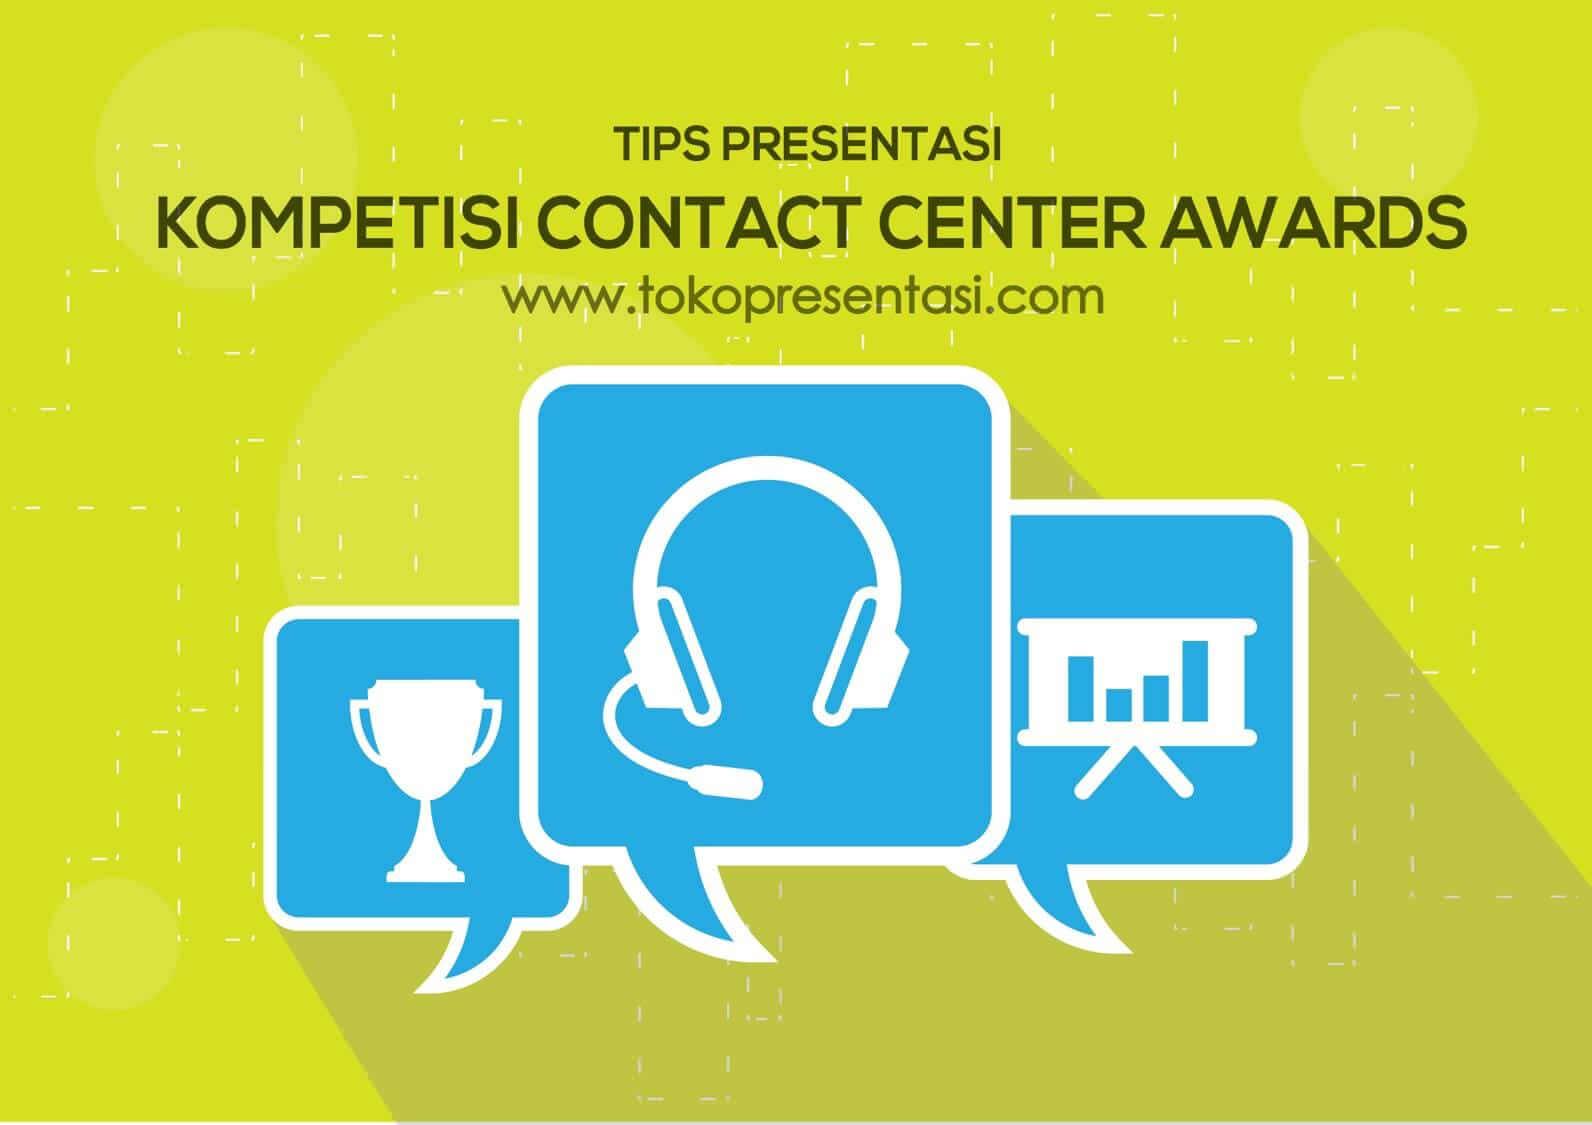 post tips sukses presentasi kompetisi desain ppt desain presentasi jasa bikin presentasi powerpoint